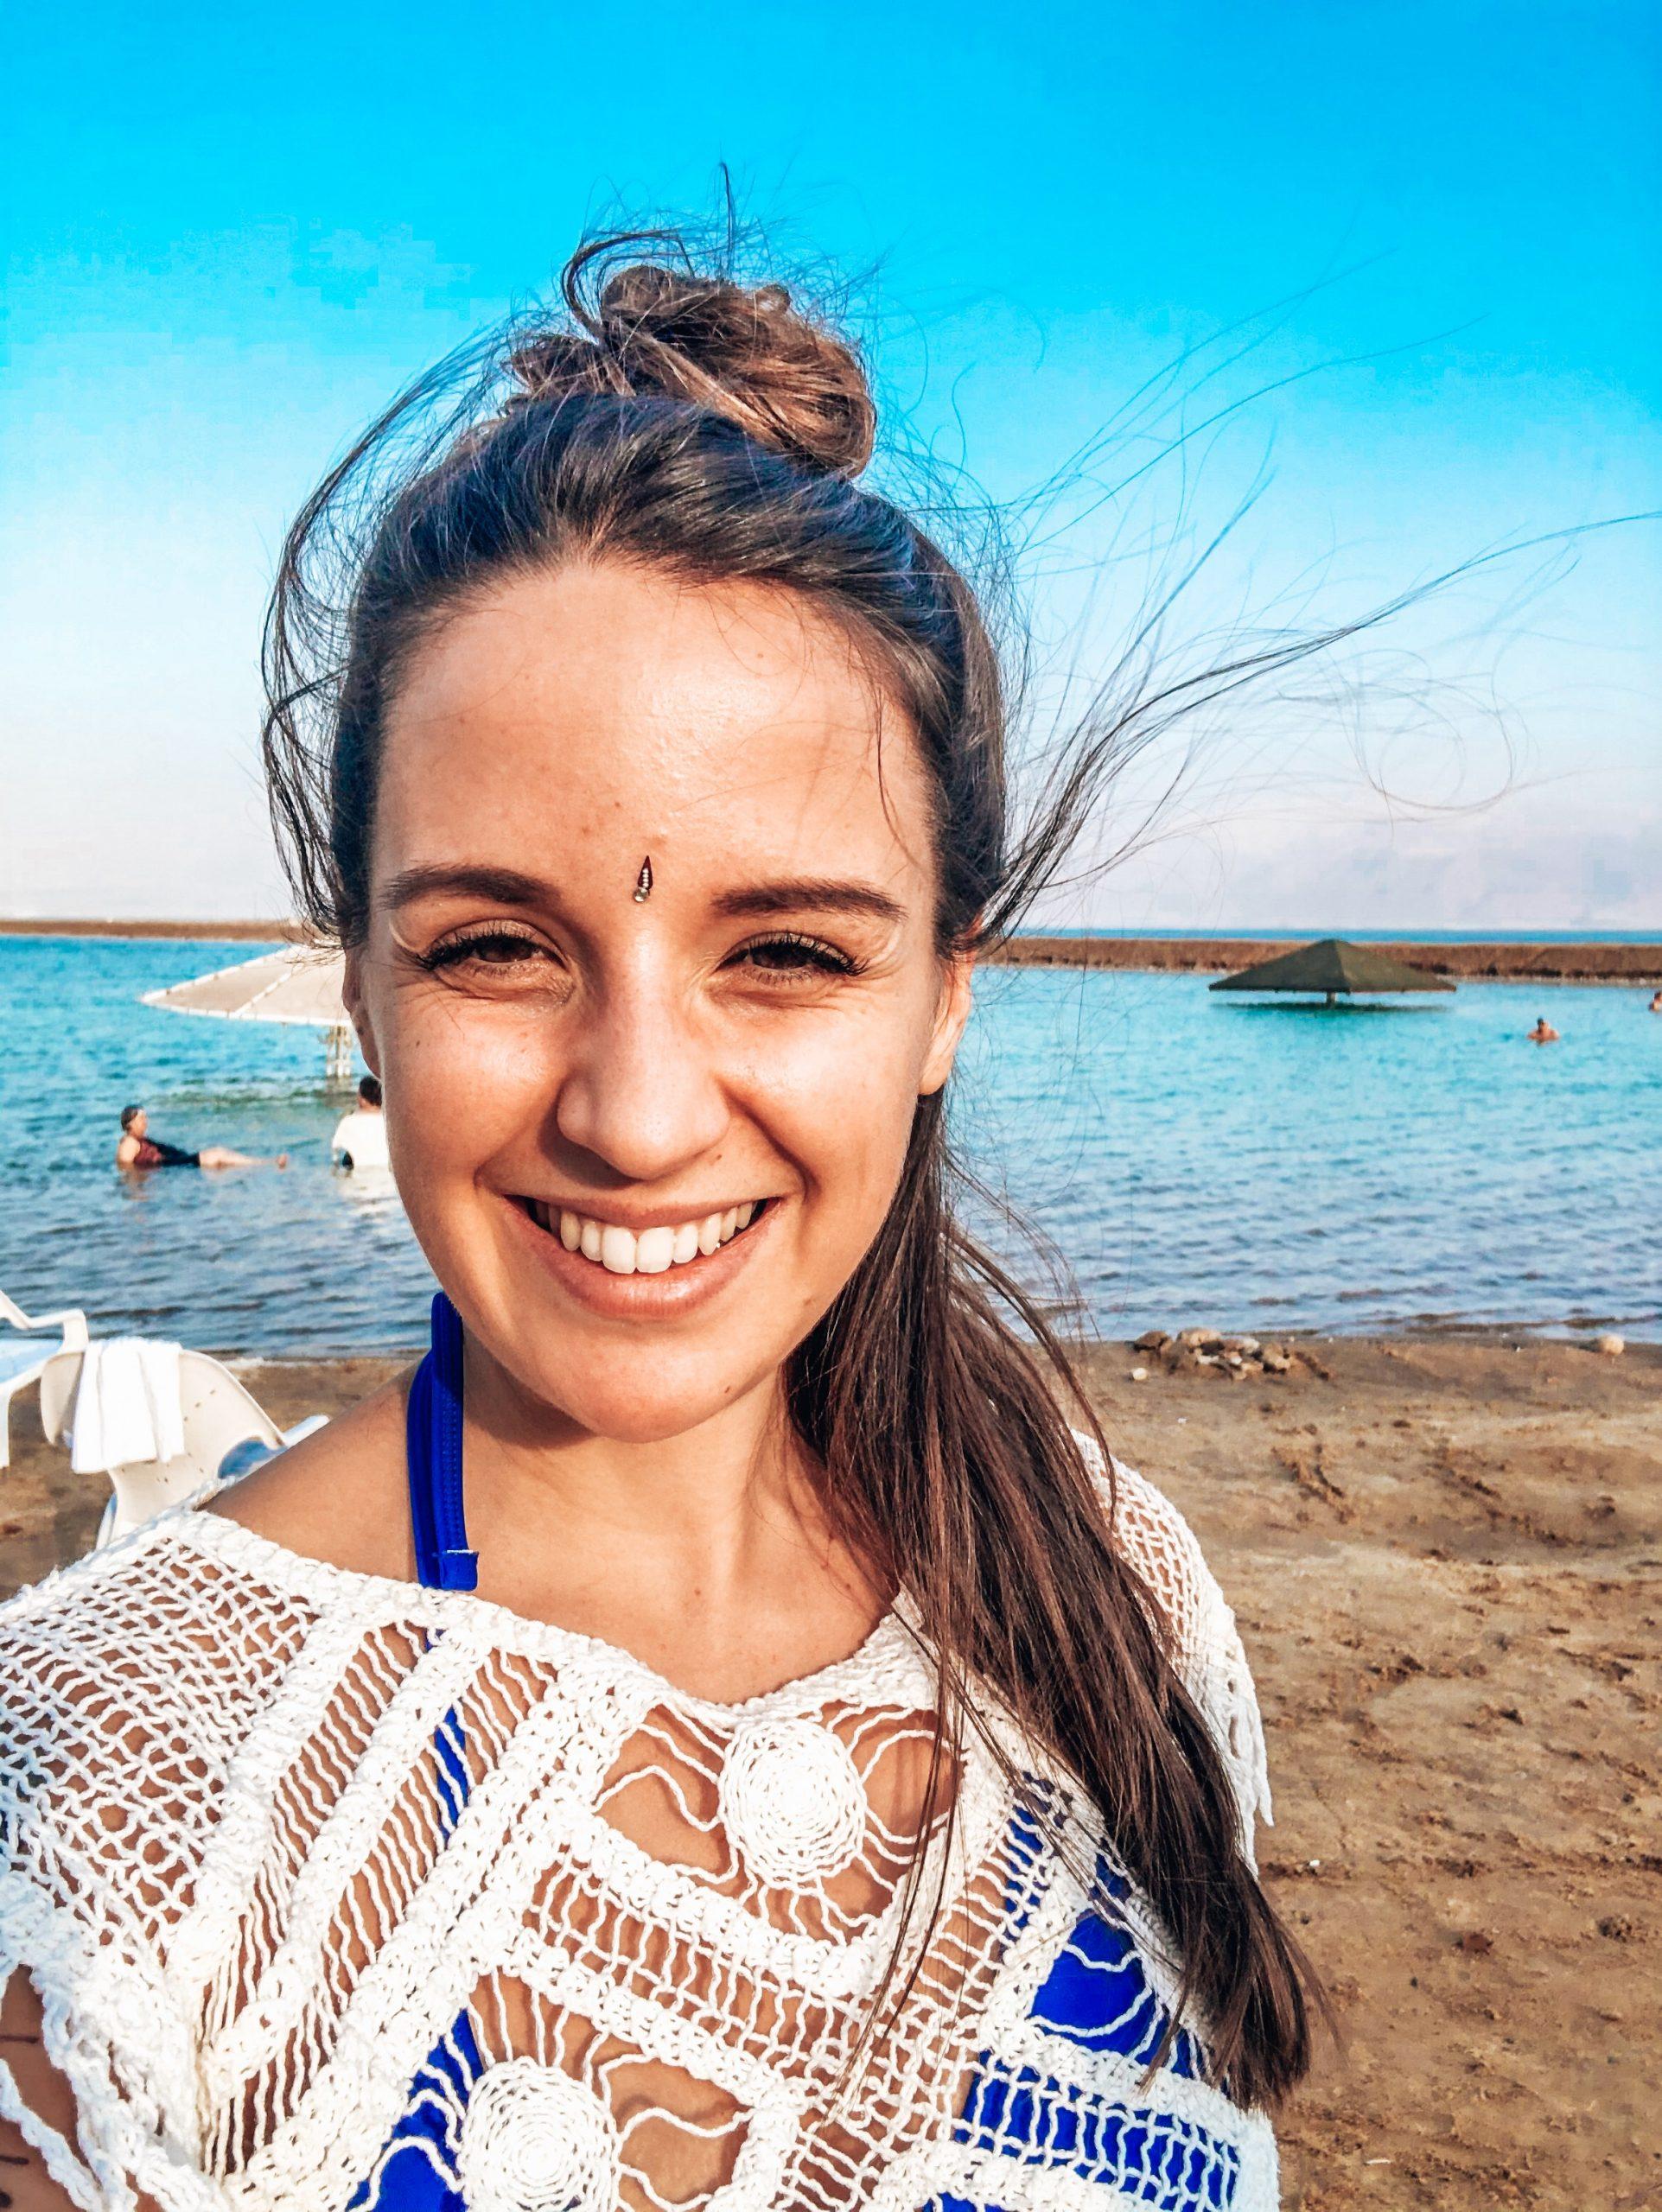 Cathy lächelnd am Meer